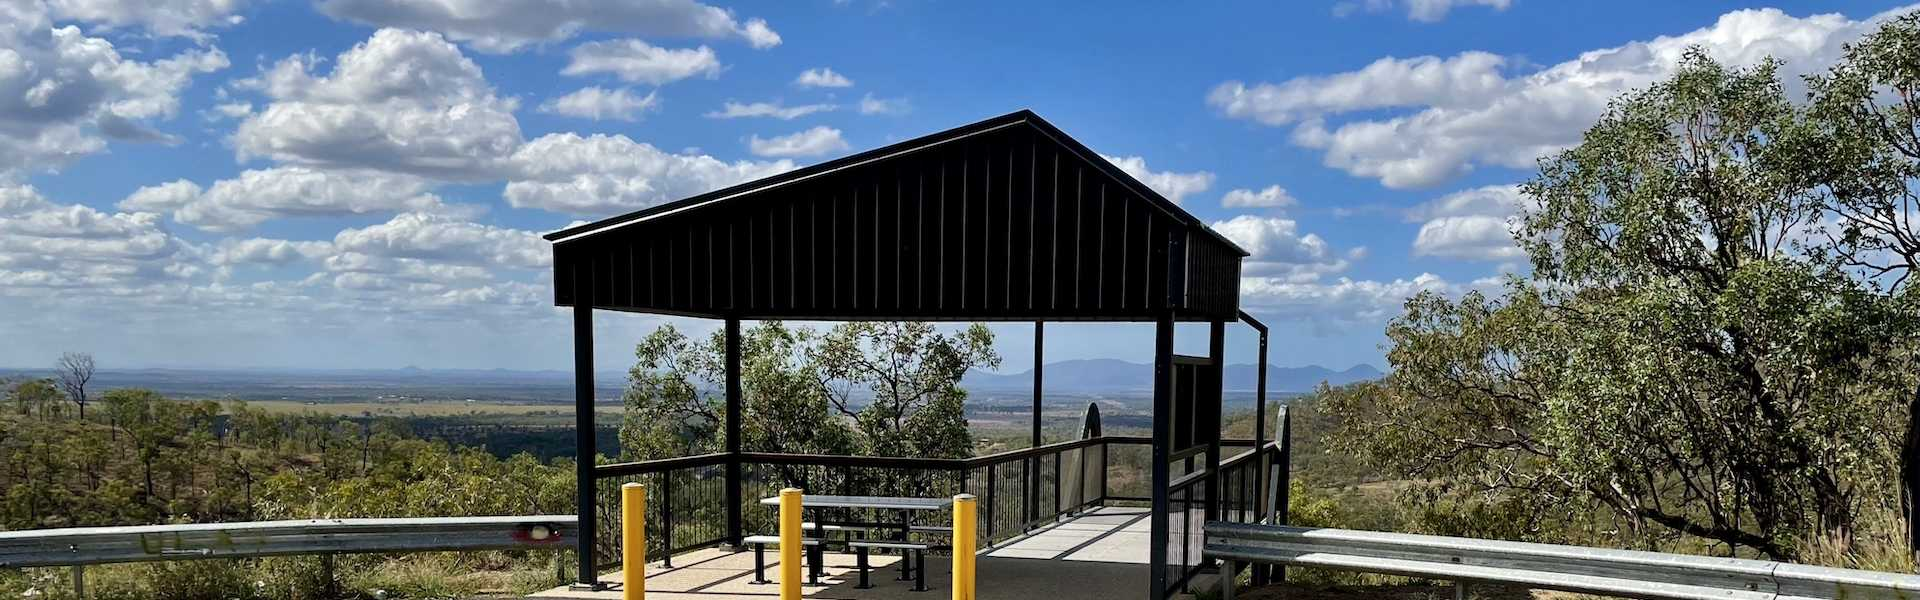 Kui Parks, Mount Morgan Motel & Van Park, Bouldercombe Lookout